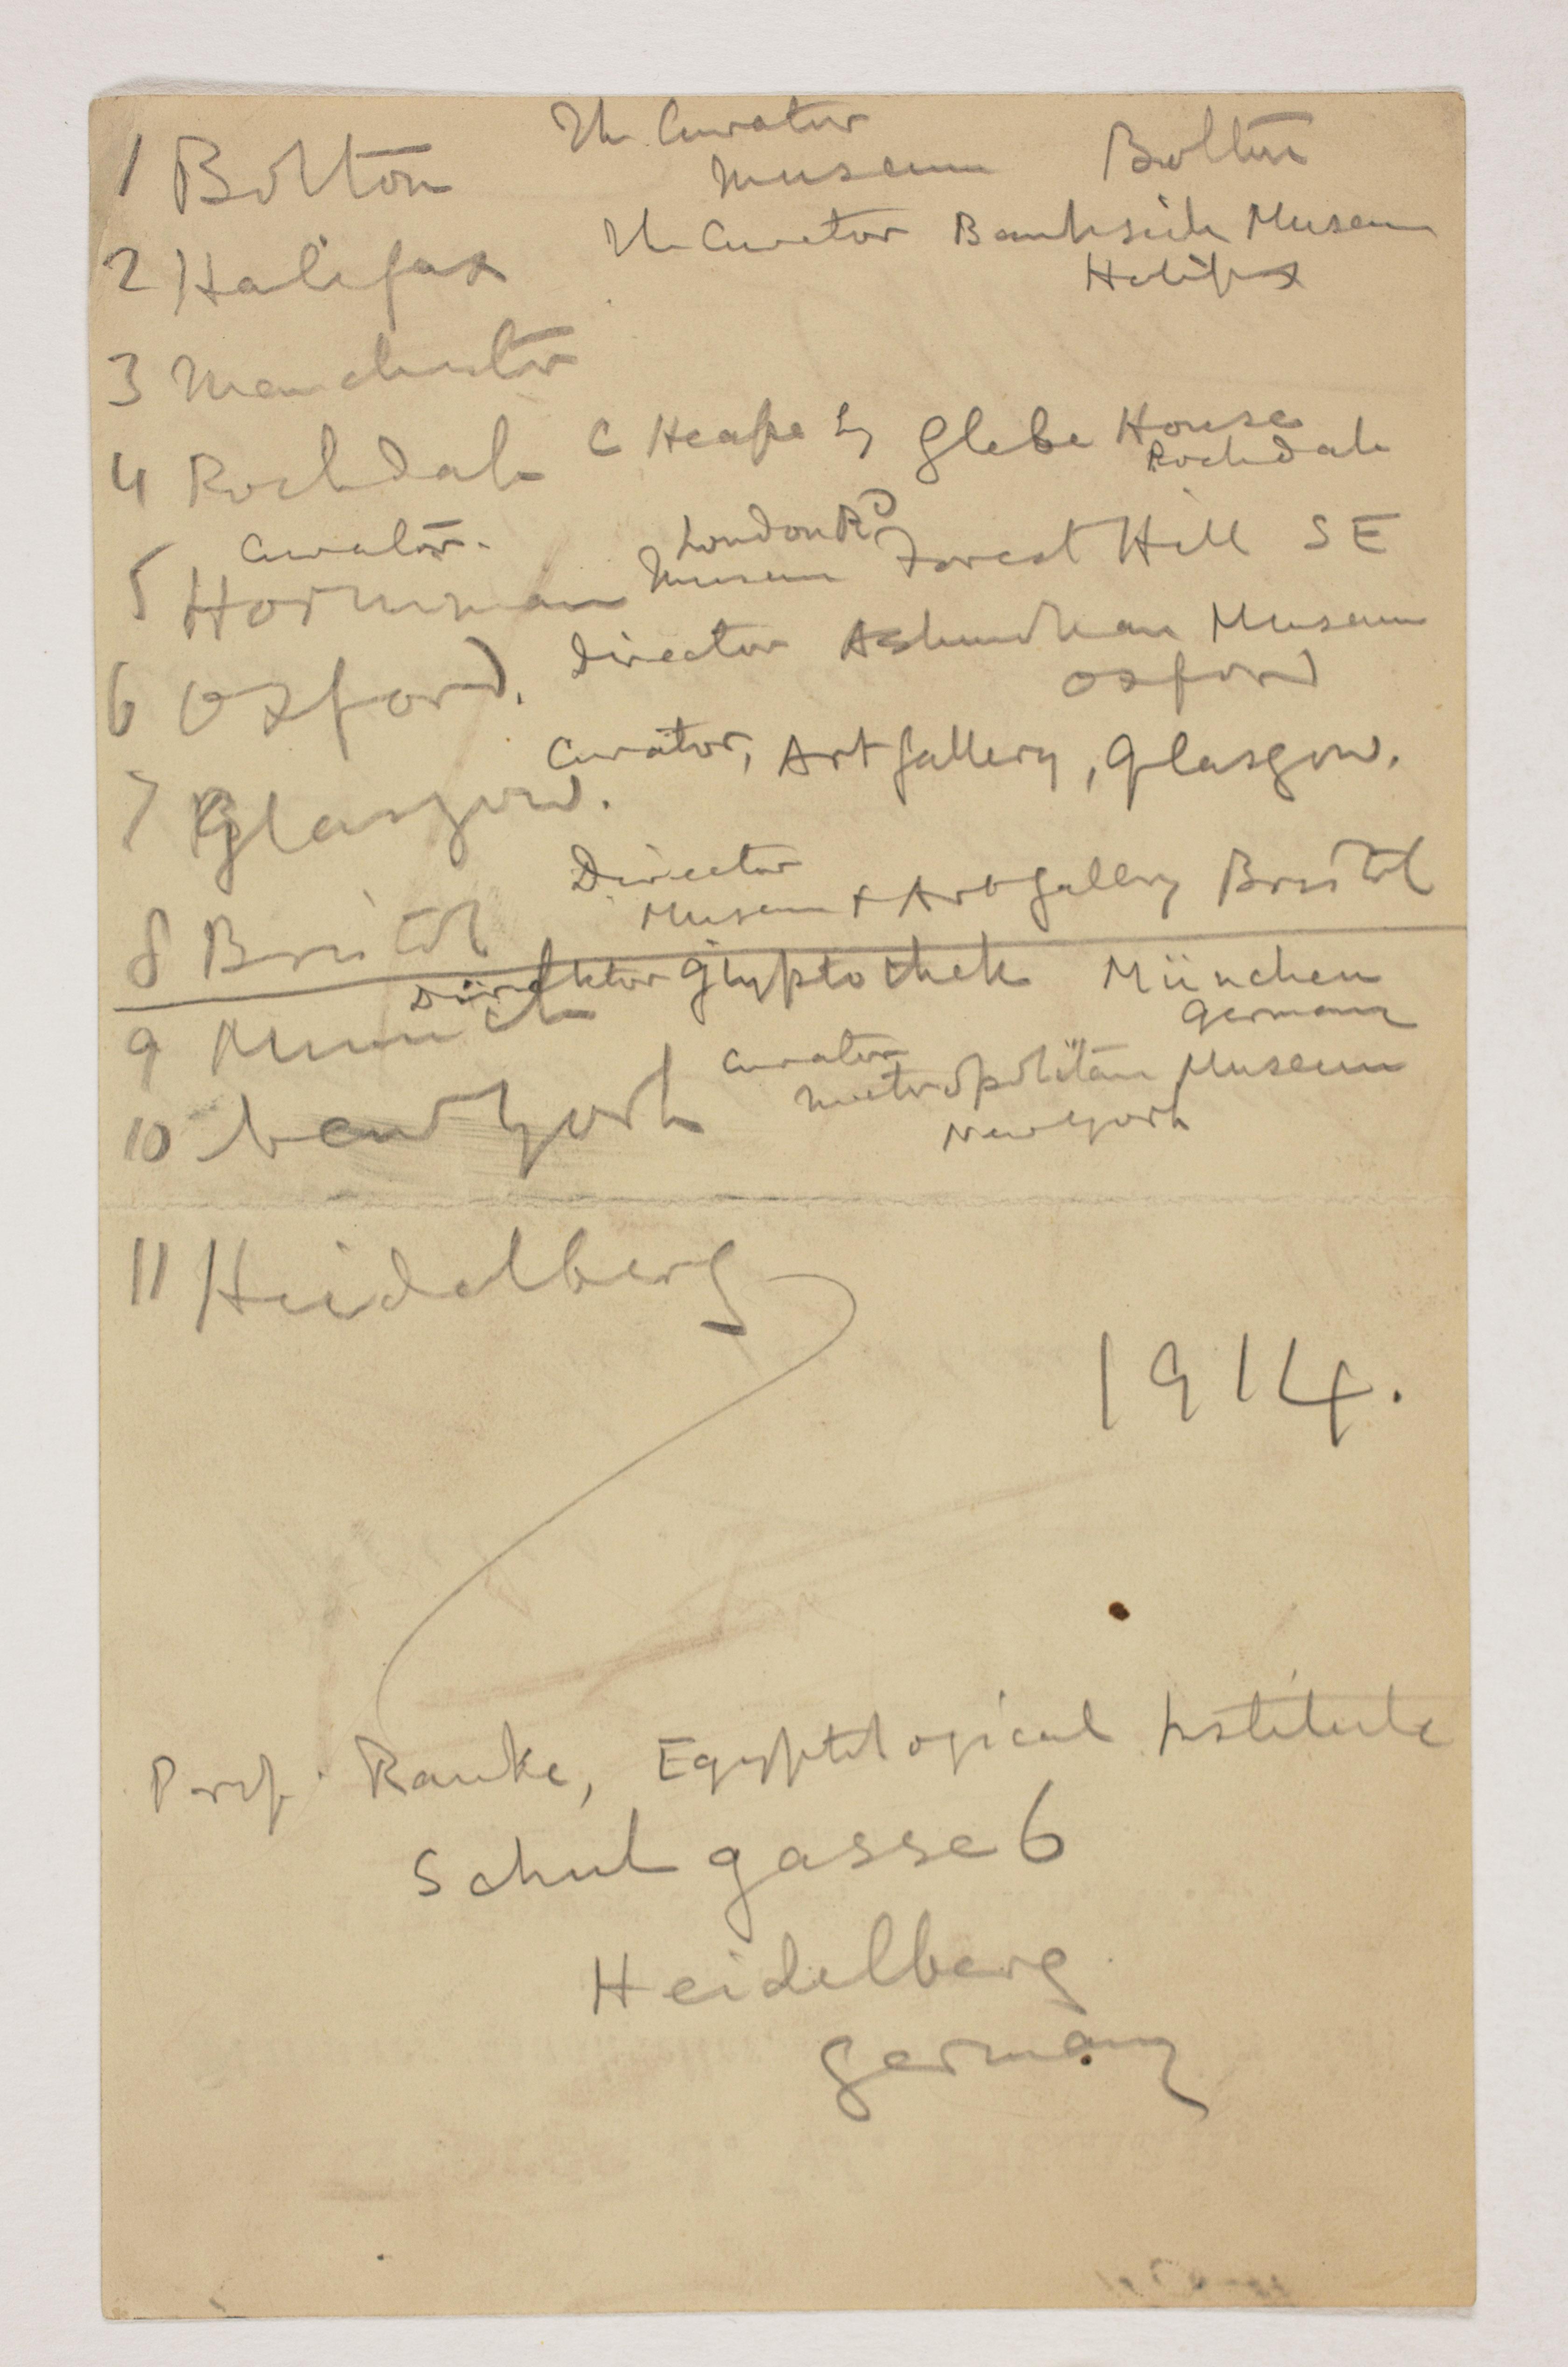 1913-14 Lahun, Haraga Distribution list PMA/WFP1/D/22/7.1